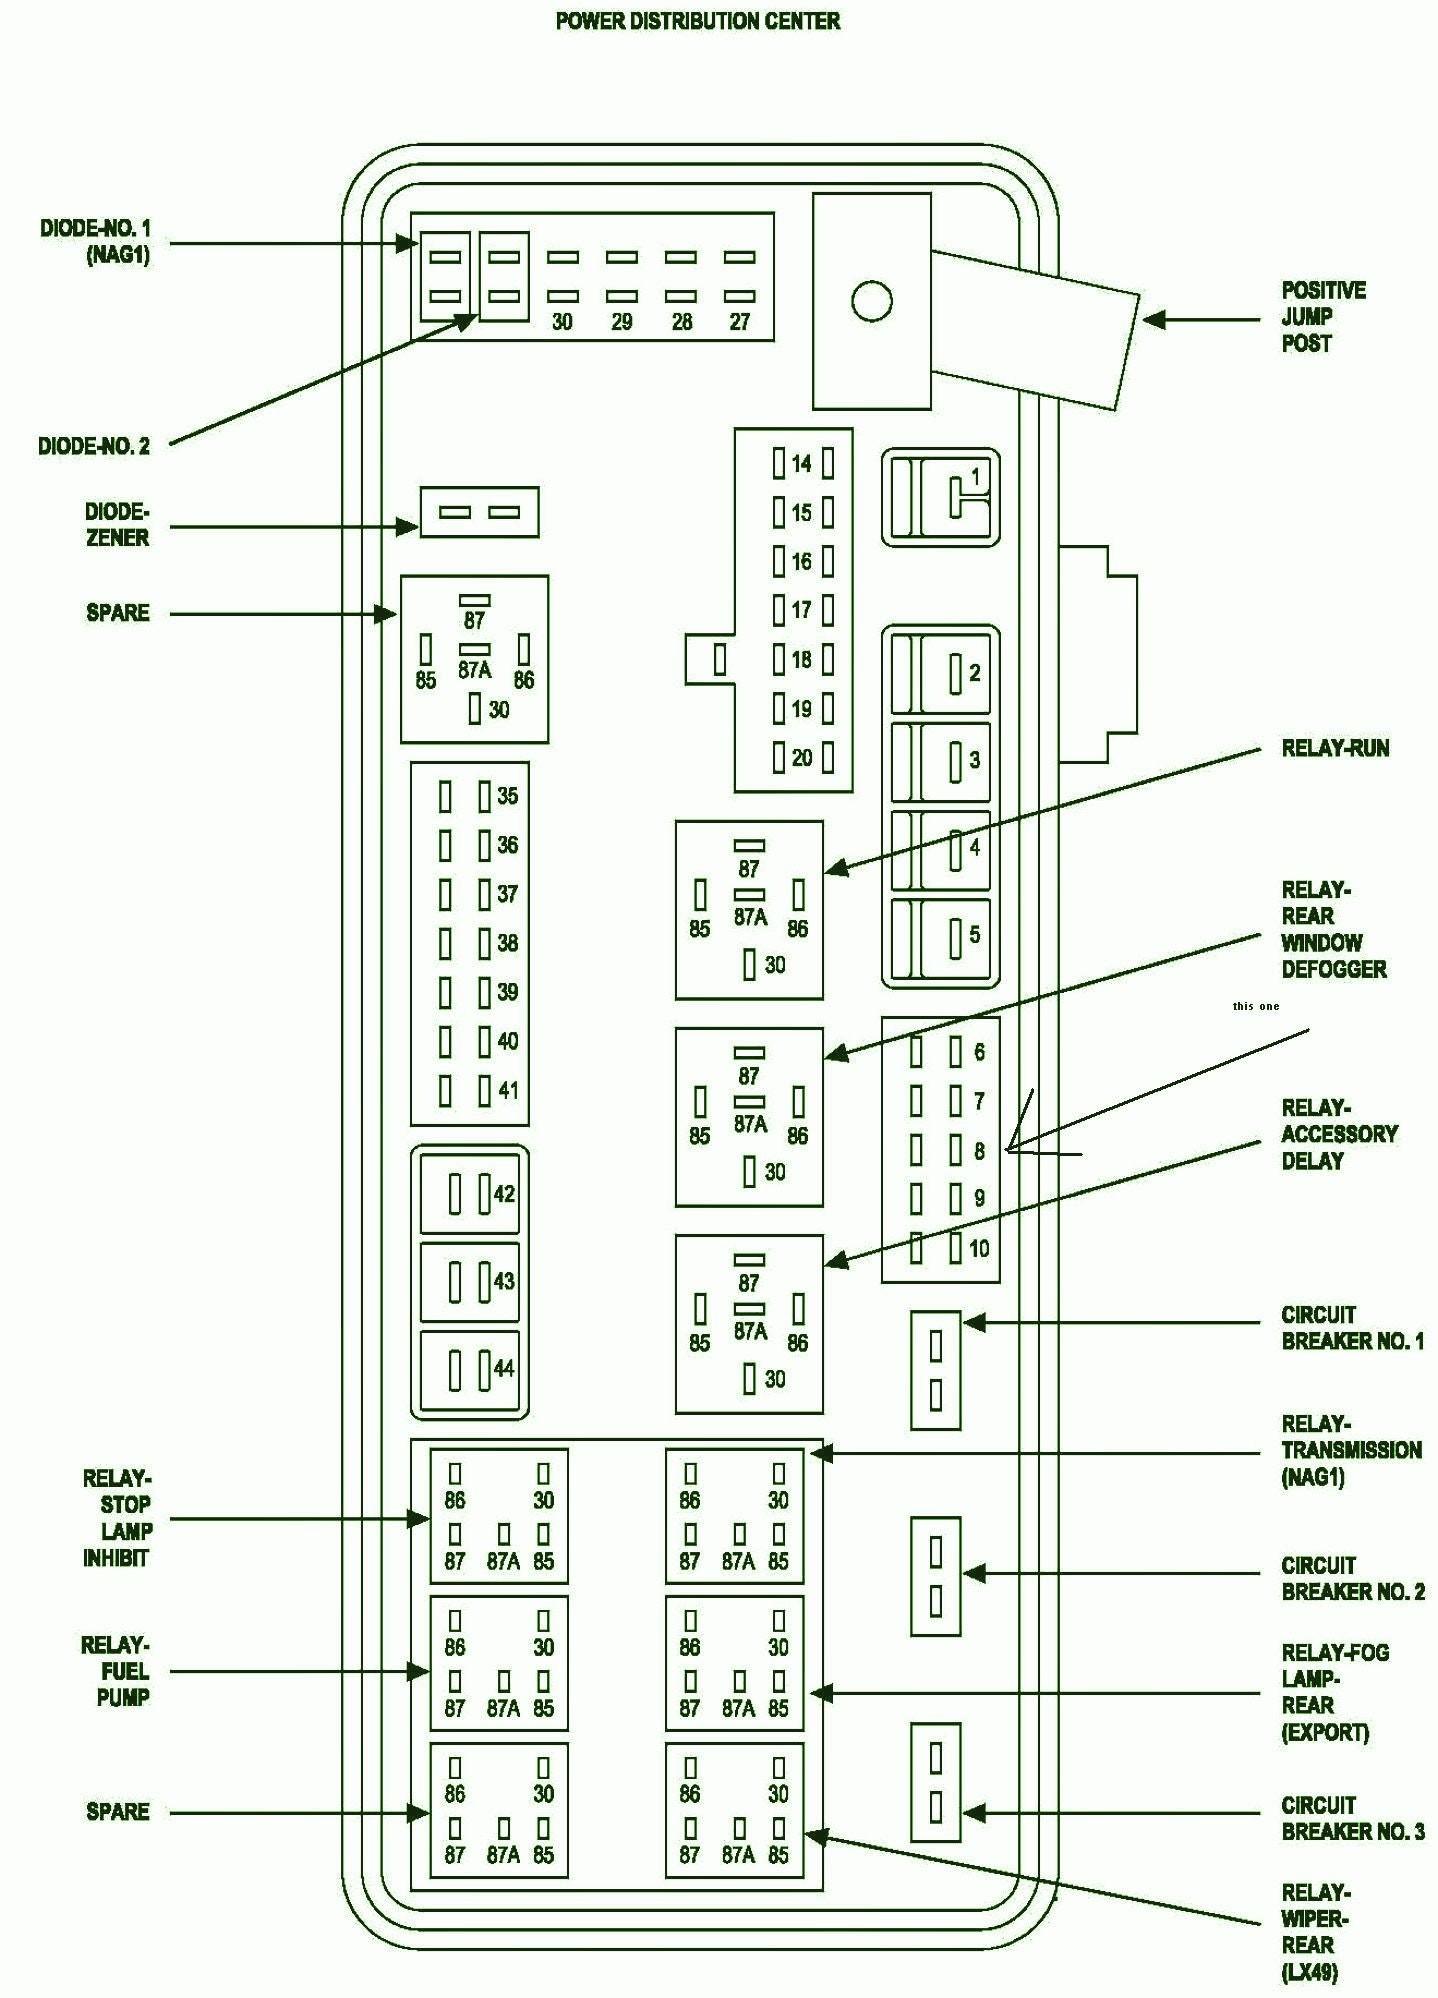 hight resolution of 2005 dodge durango engine diagram dodge durango fuse box diagram 2007 dodge durango radio wiring of